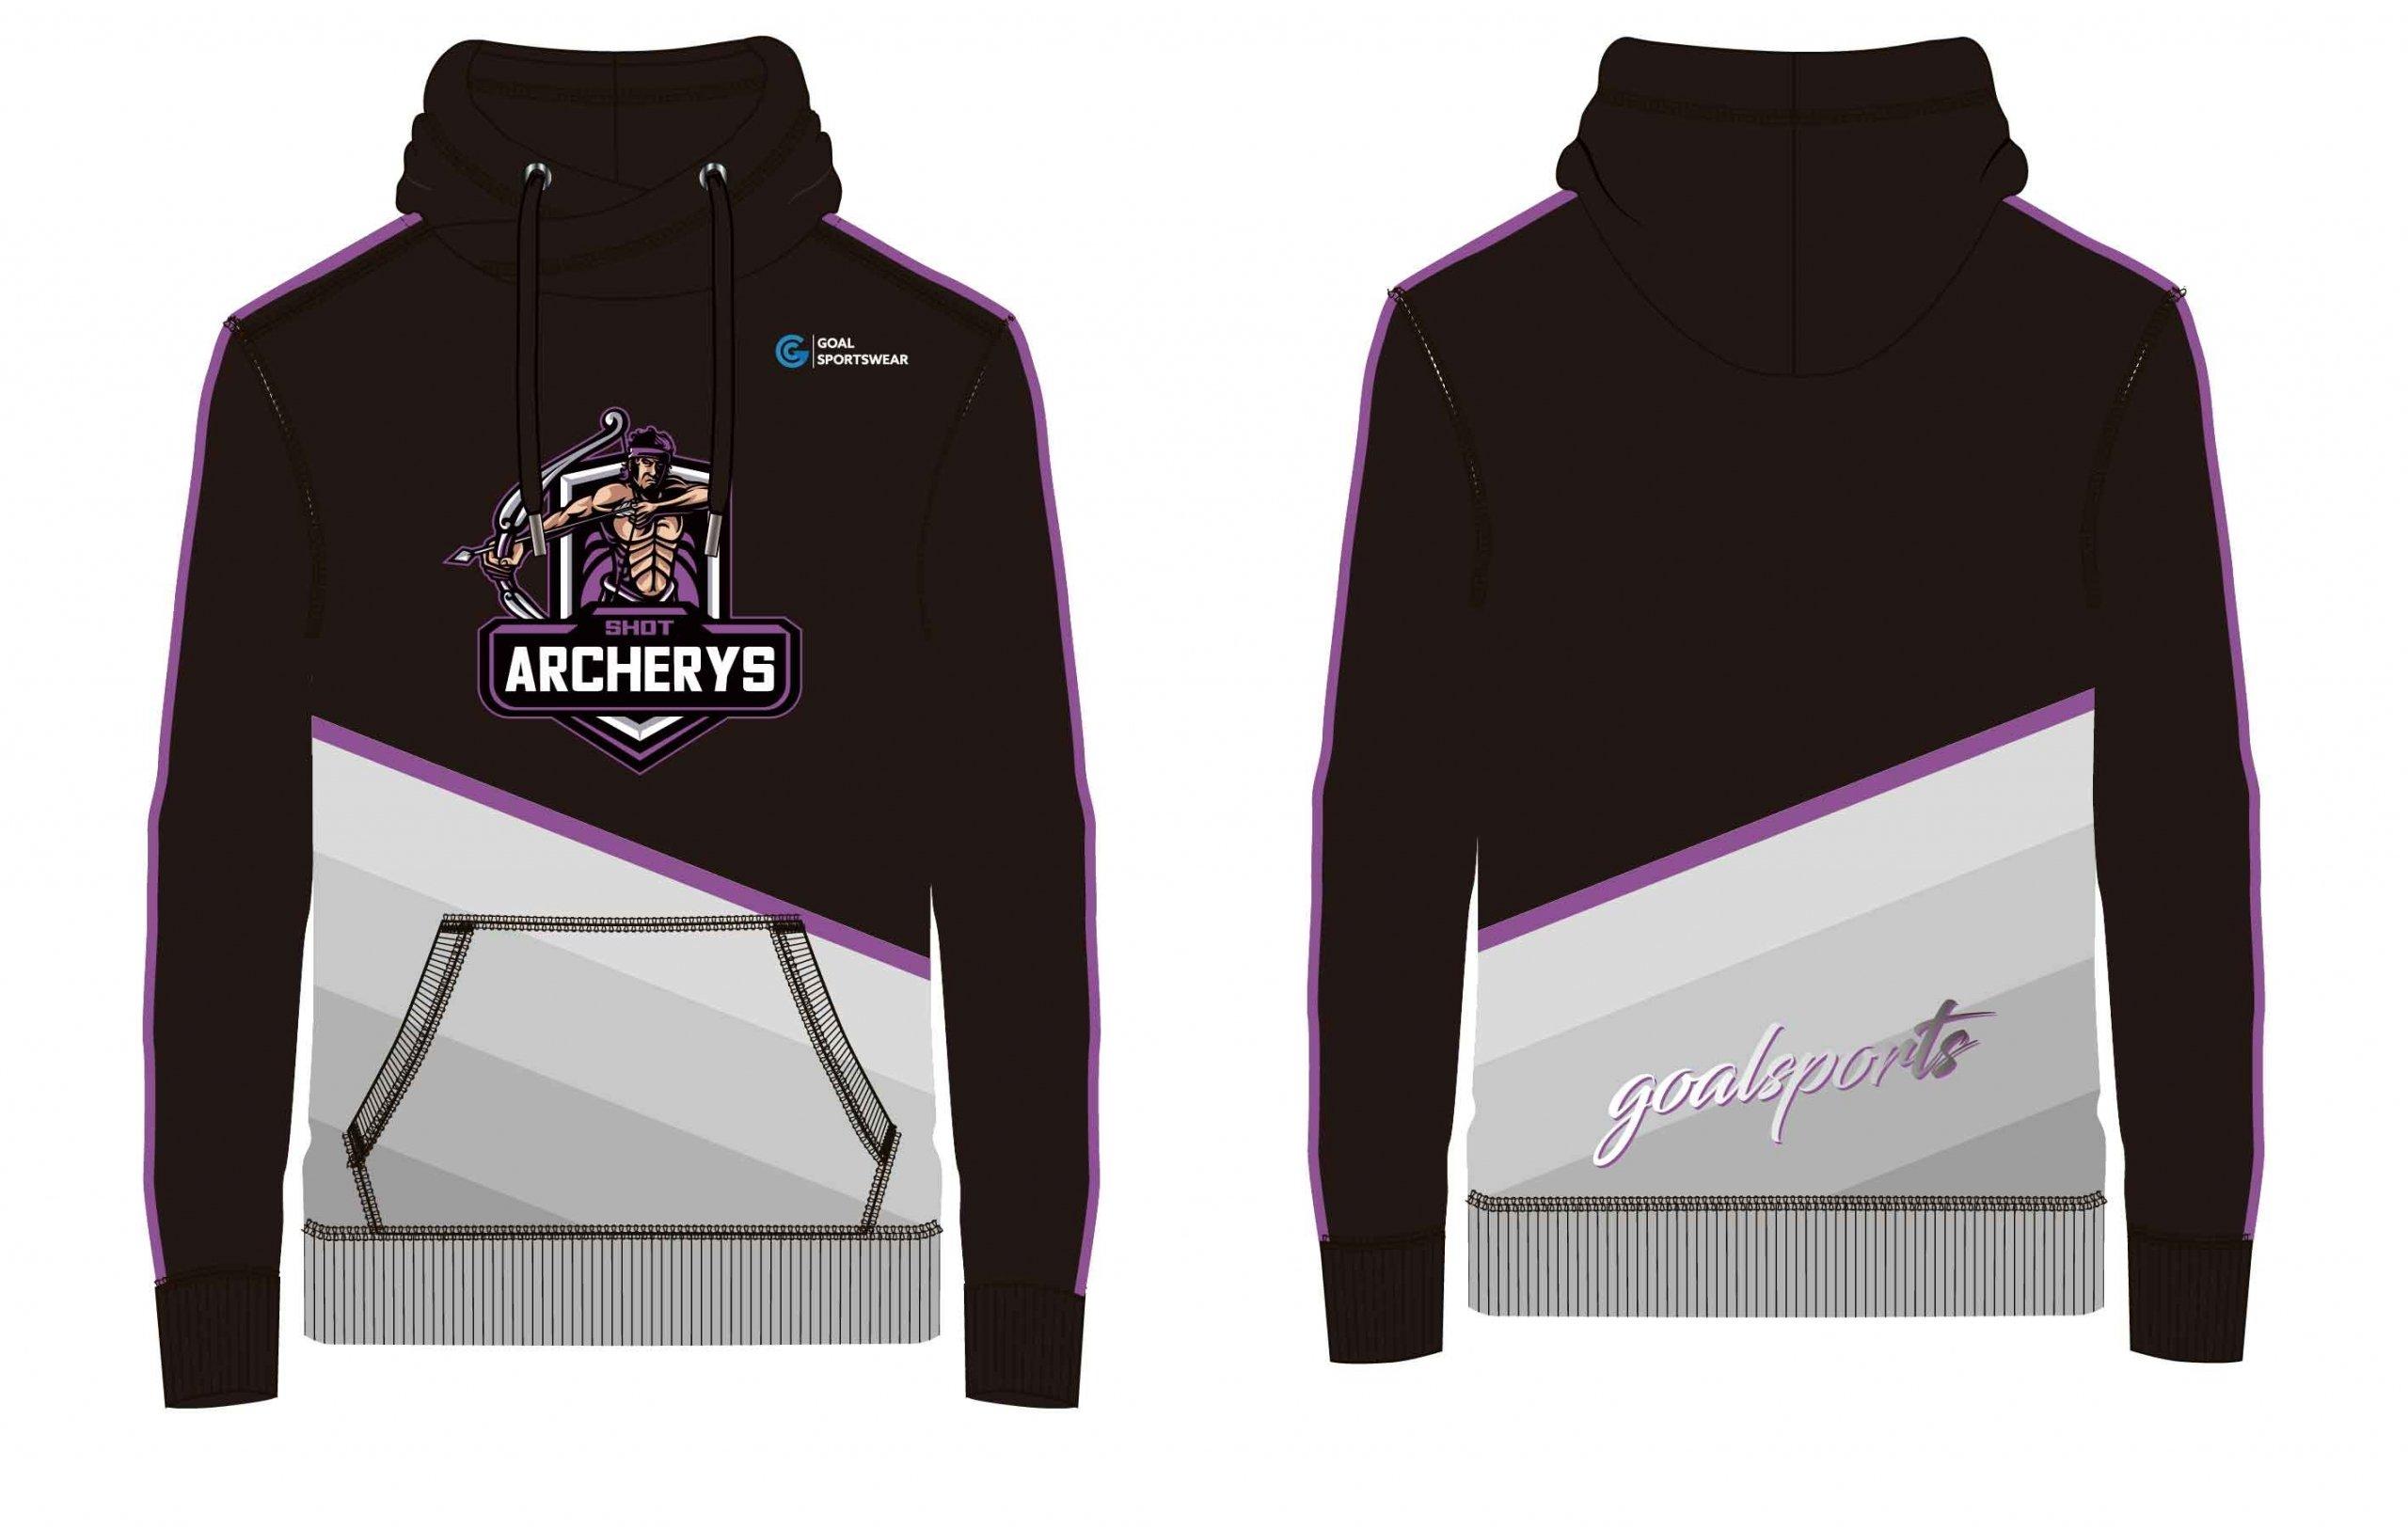 wholesale 100% polyester custom sublimated printed wrestling hoodies